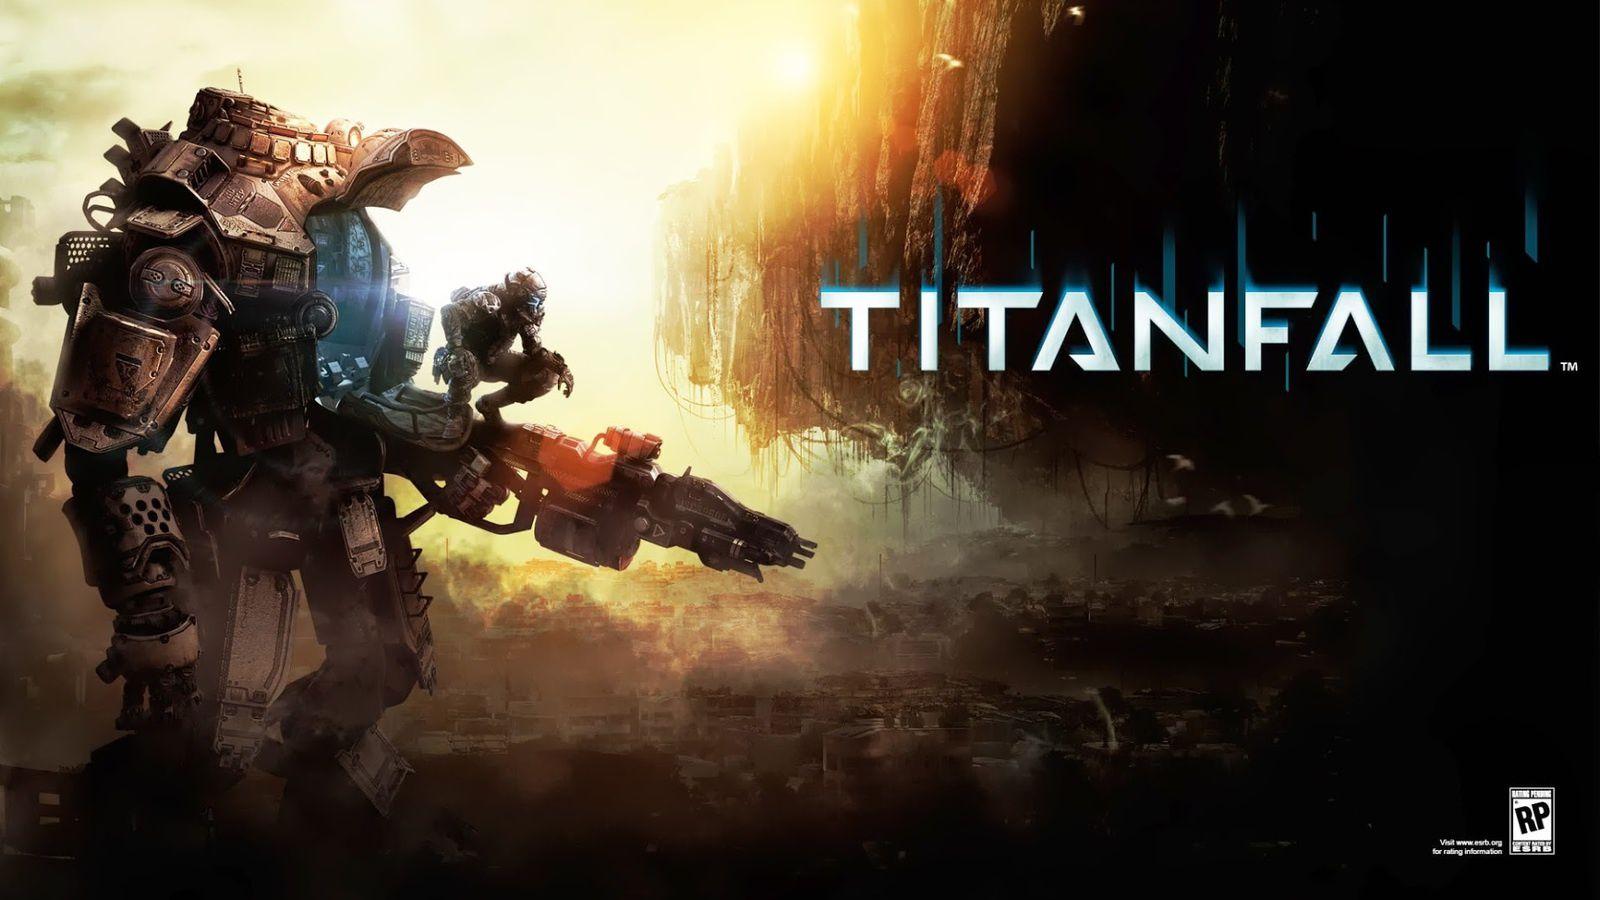 TitanFall PC Vs Xbox One